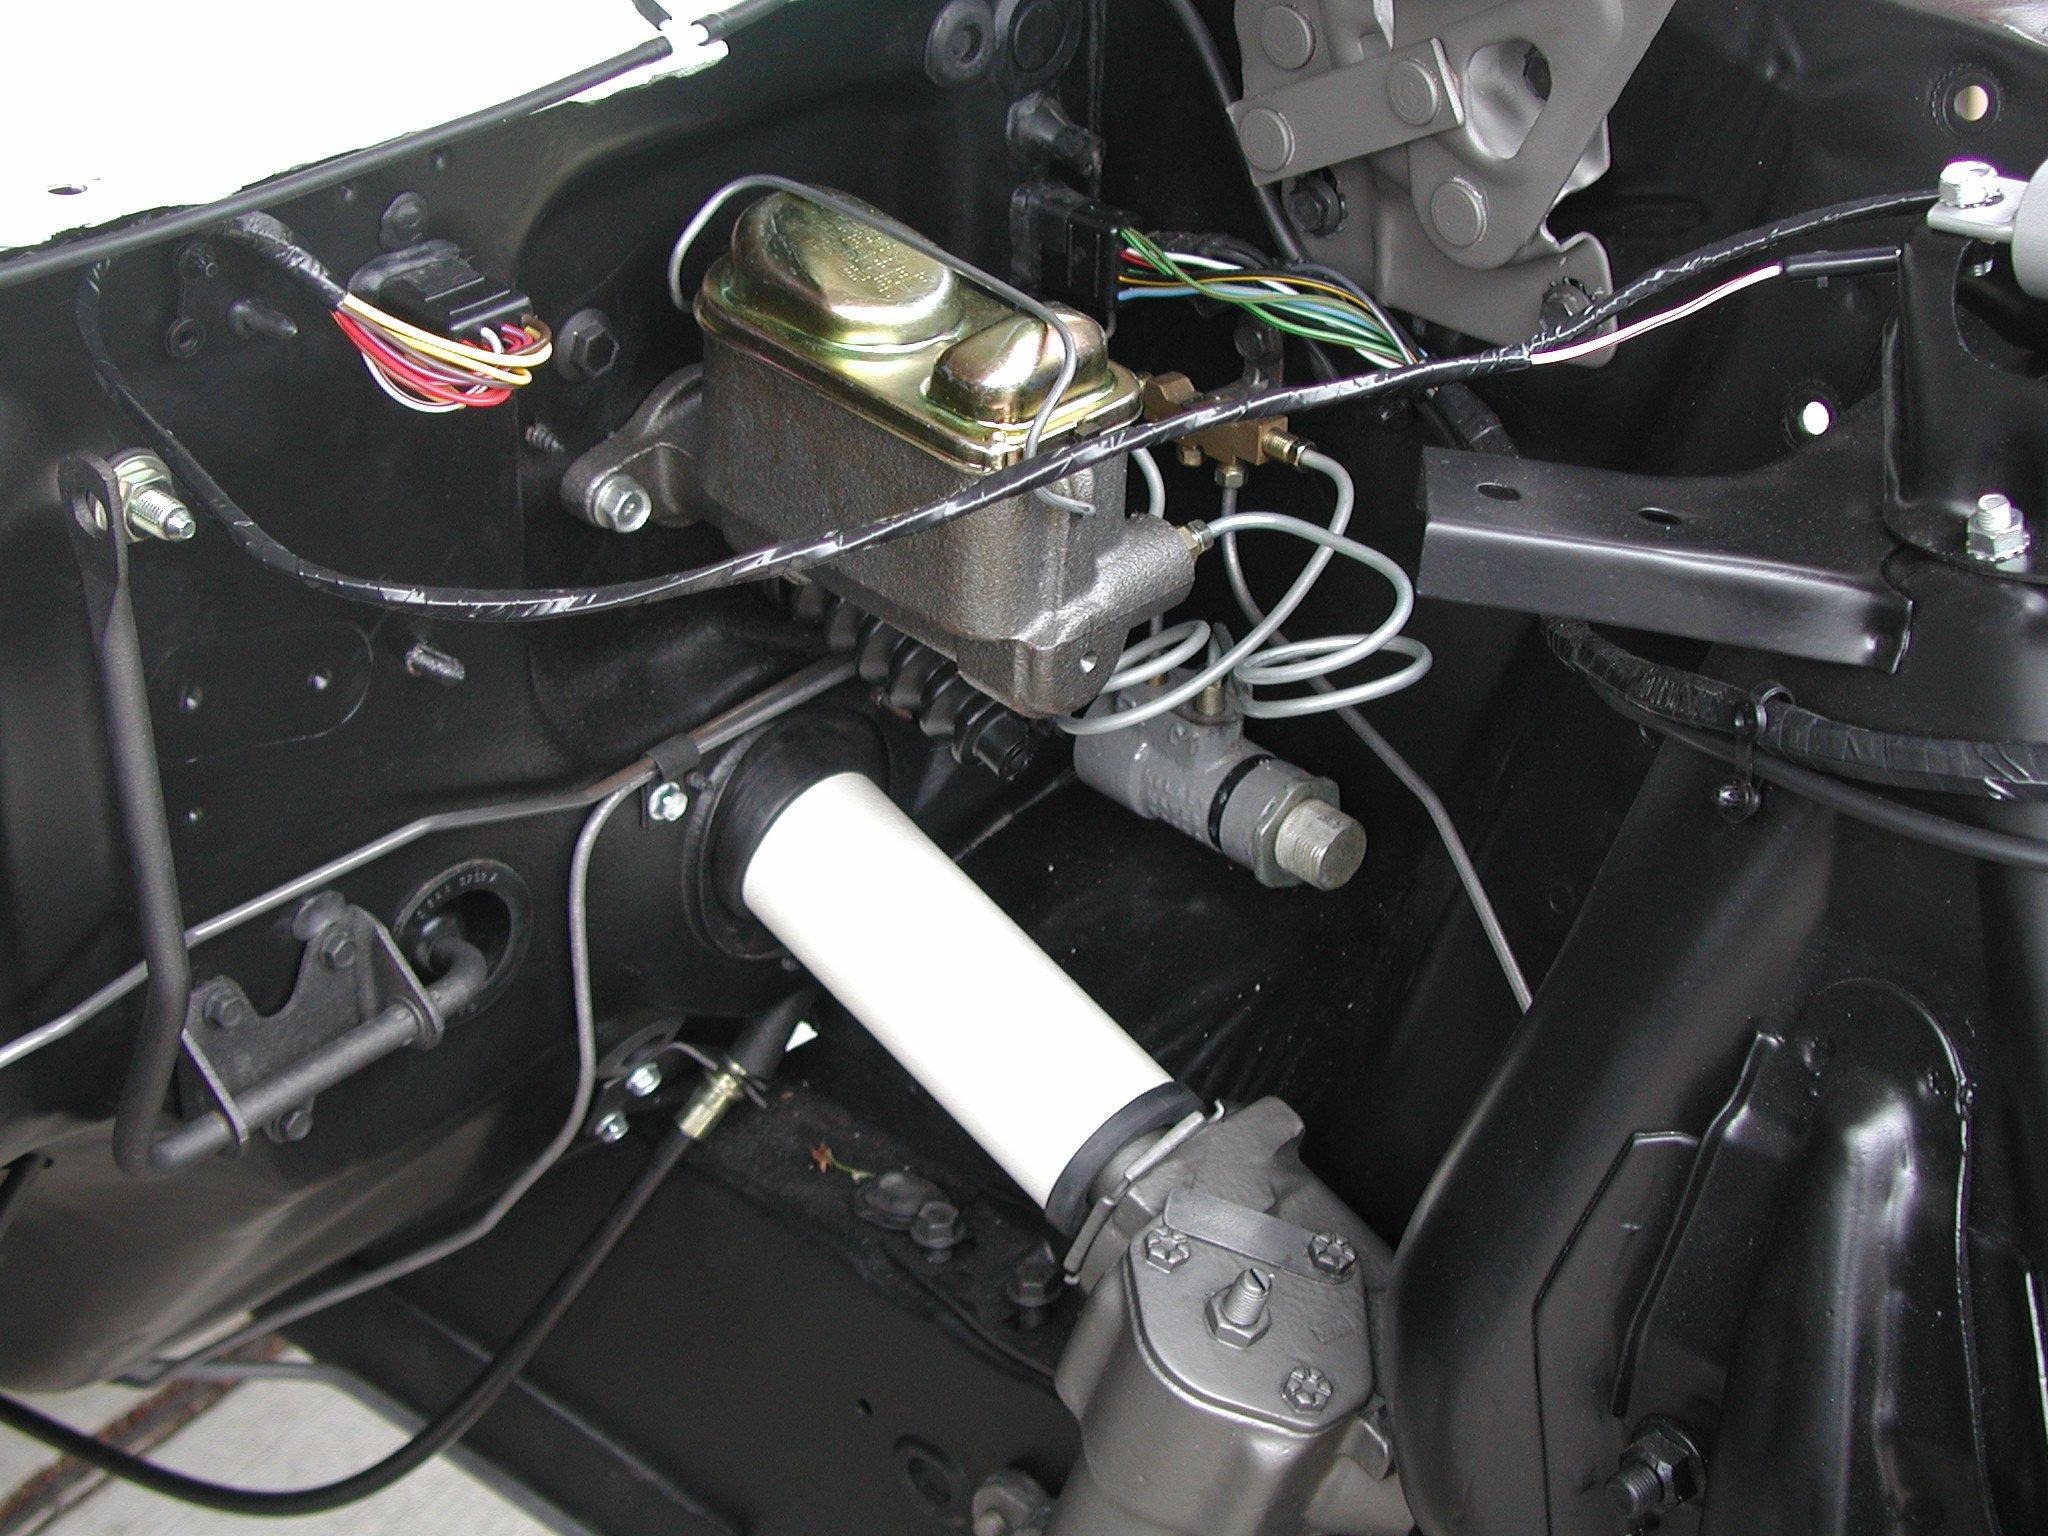 [DIAGRAM_1CA]  1966 Mustang. Engine bay detailing? | Ford Mustang Forum | 1966 Mustang Engine Wiring |  | All Ford Mustangs